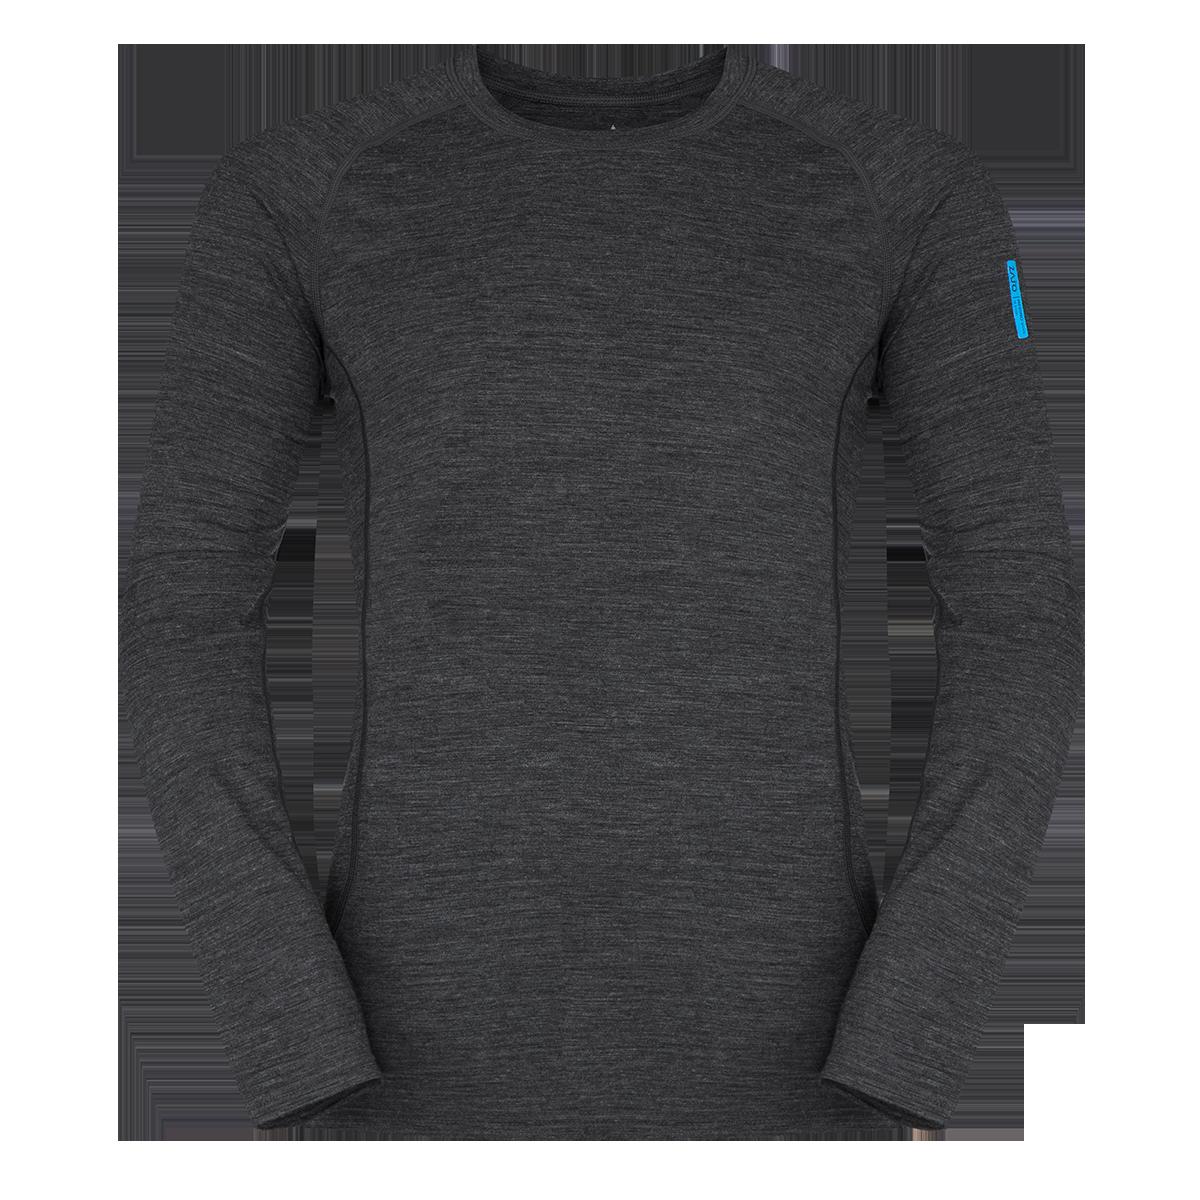 Zajo Bjorn Merino Tshirt LS Black 1